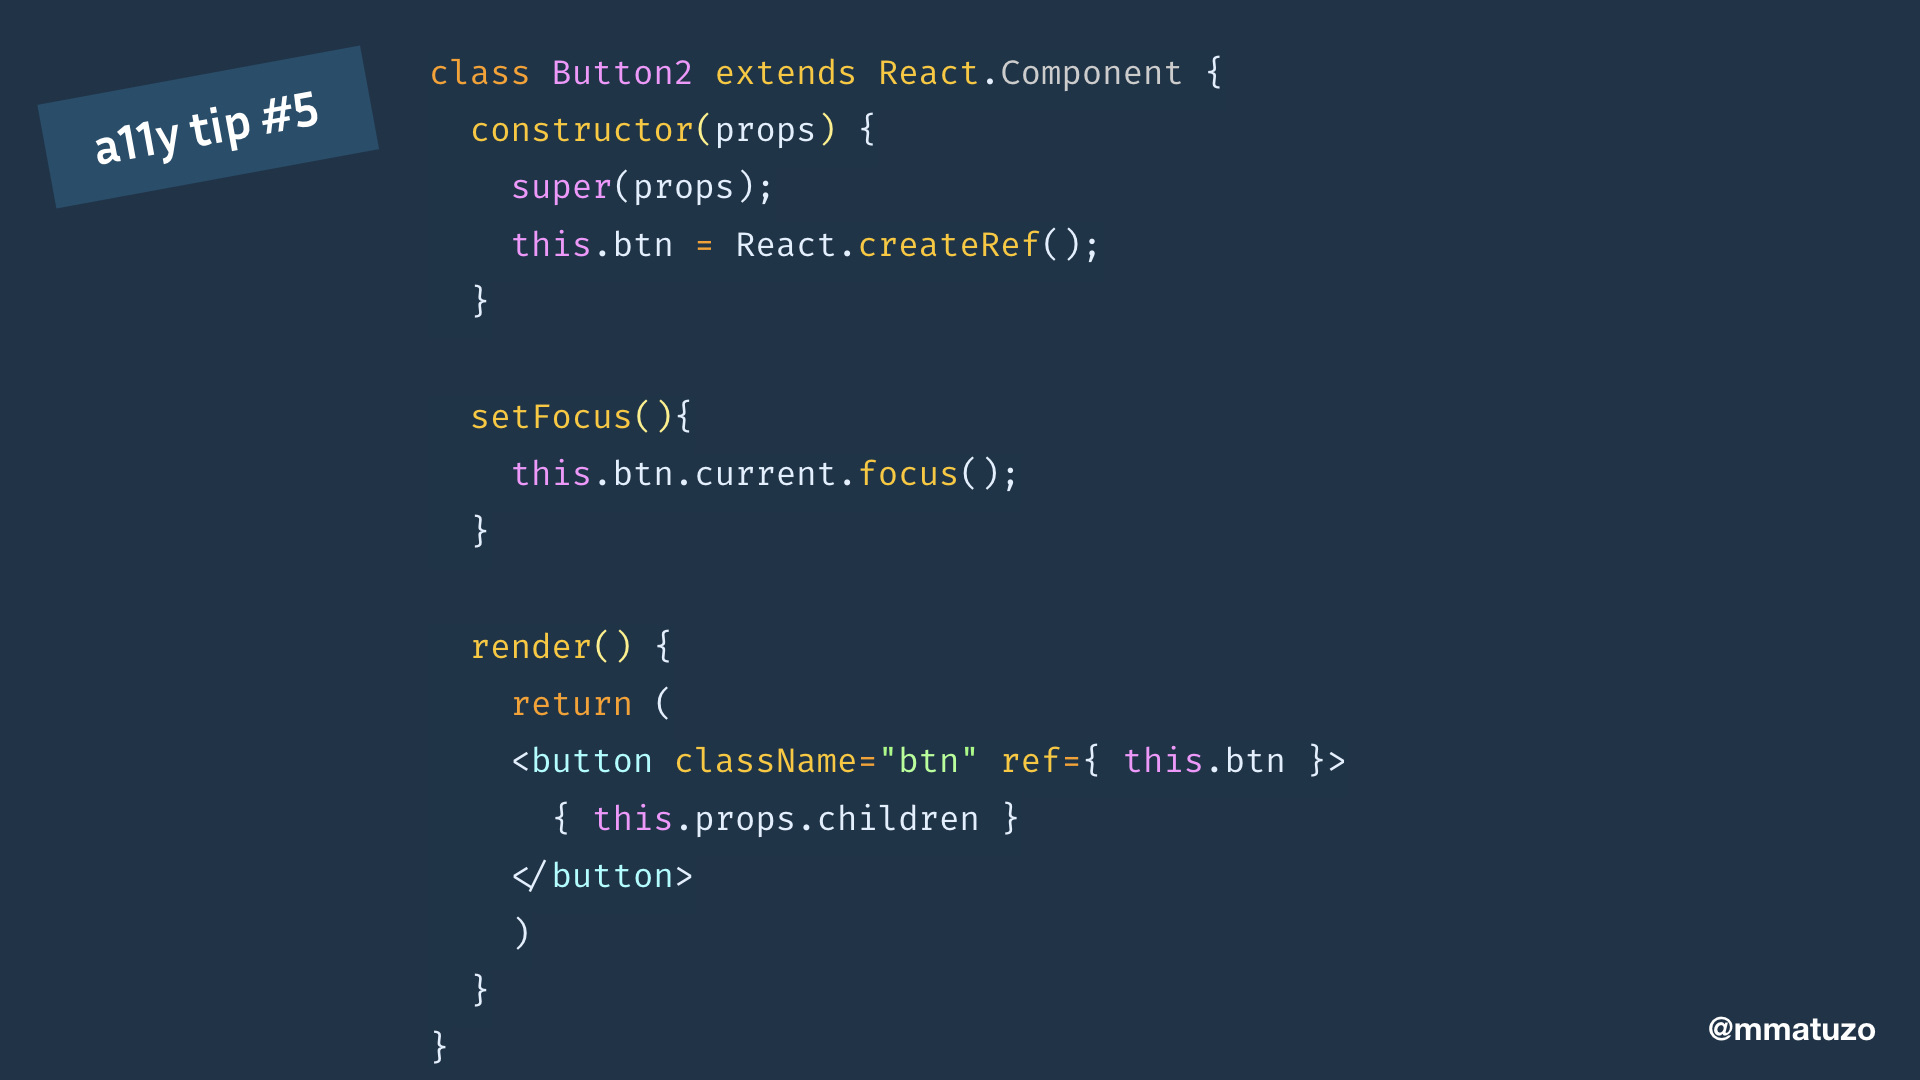 "class Button2 extends React.Component { constructor(props) { super(props); this.btn = React.createRef(); } setFocus(){ this.btn.current.focus(); } render() { return ( <button className=""btn"" ref={ this.btn }> { this.props.children }  ) }}"